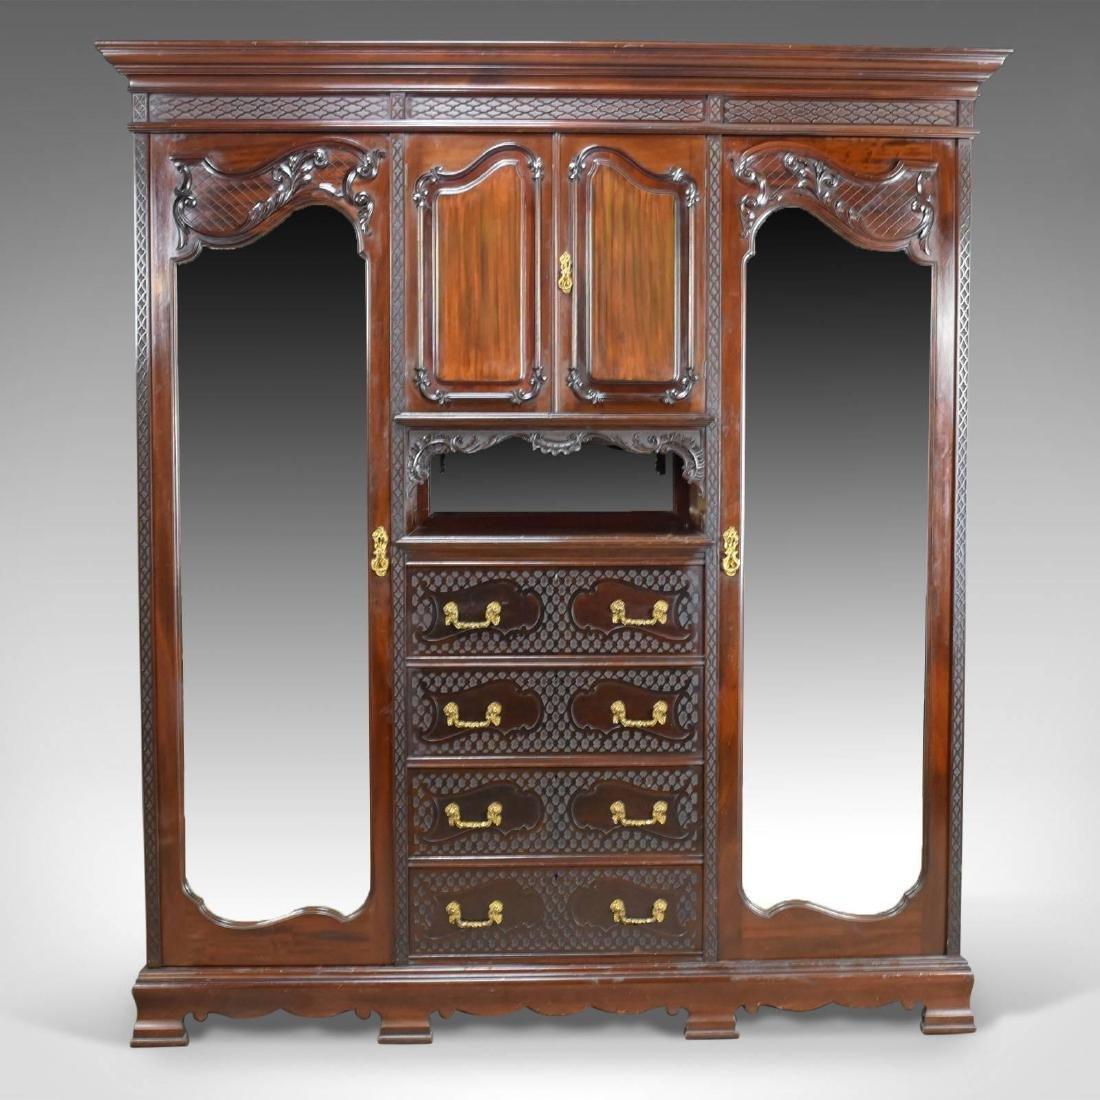 Antique Wardrobe, Carved Mahogany, English, Compactum, - 2